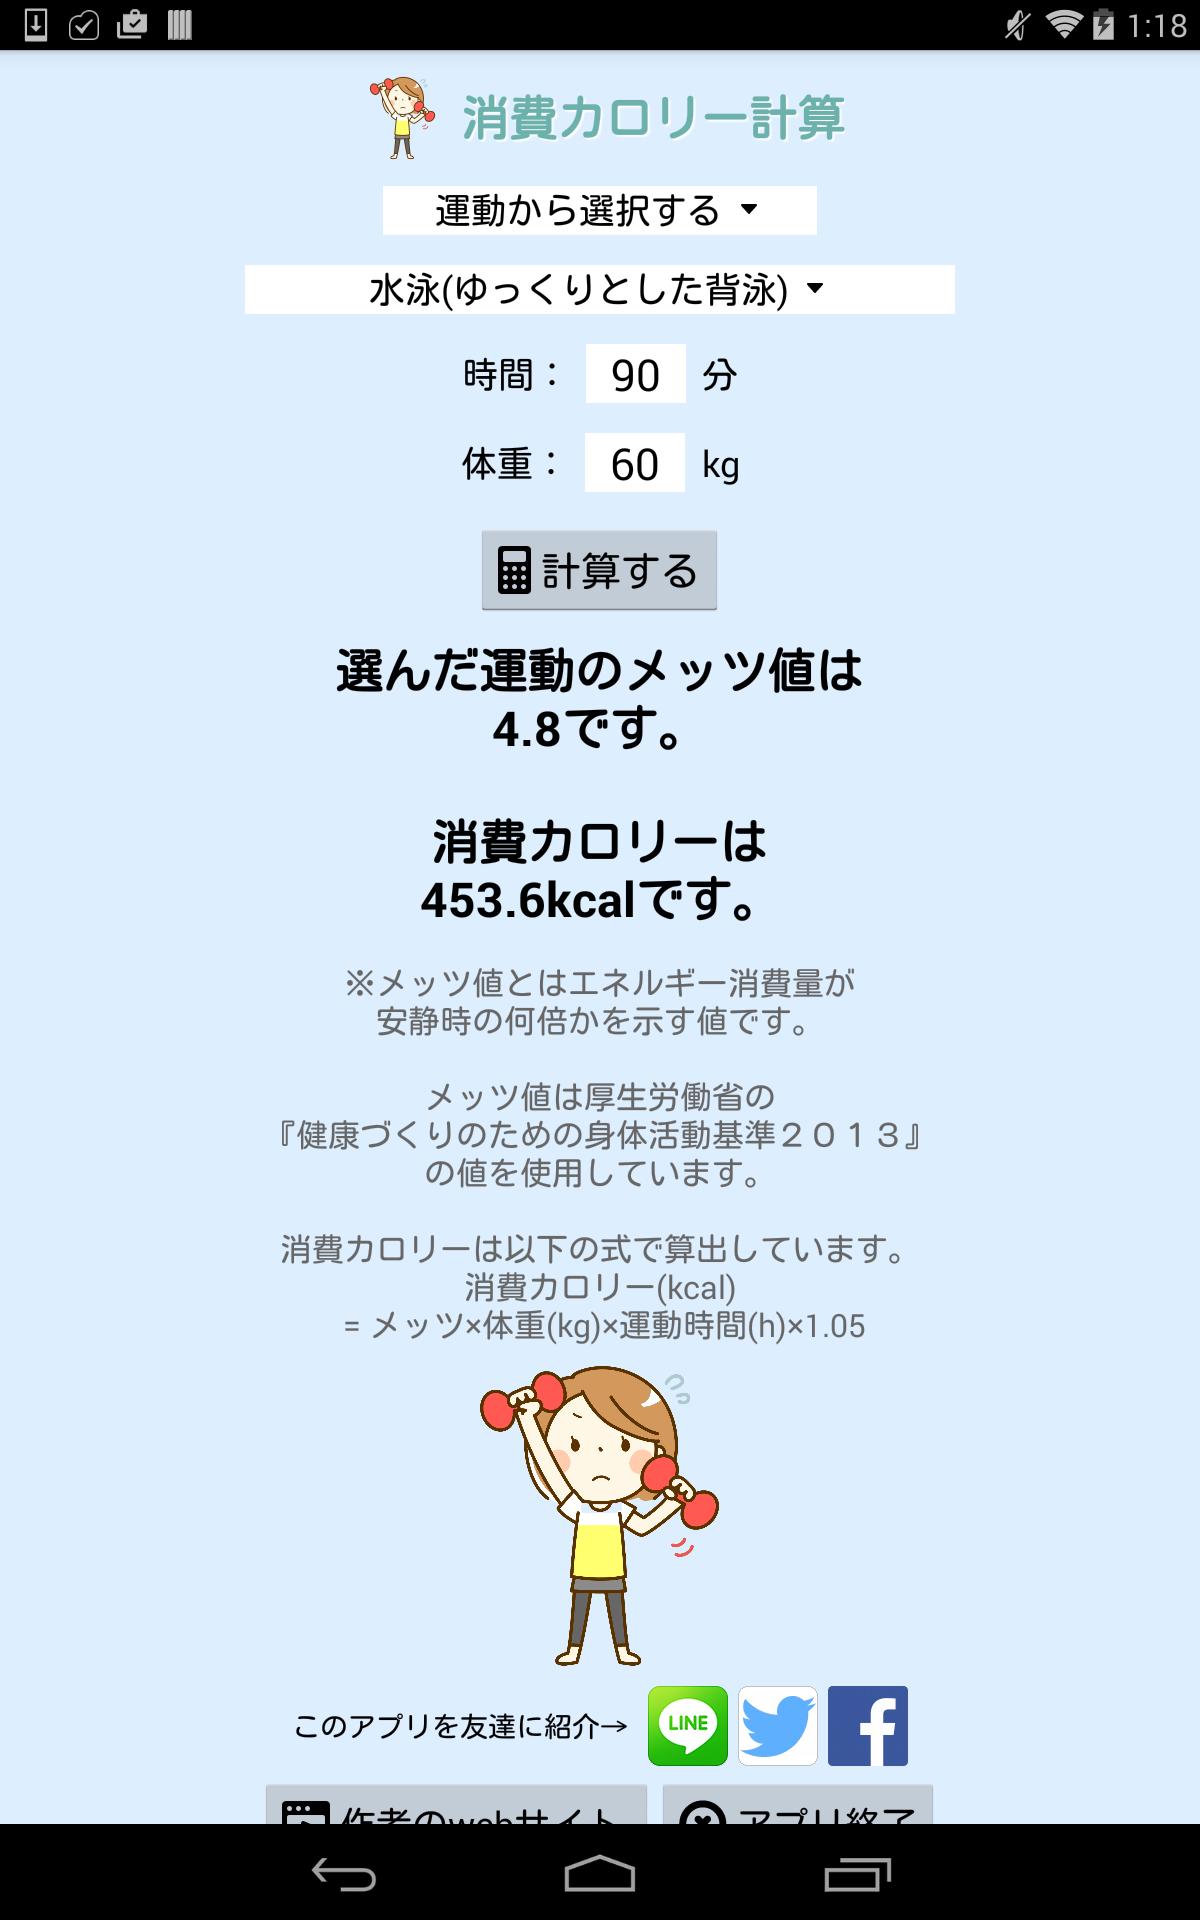 device-2015-03-16-011857